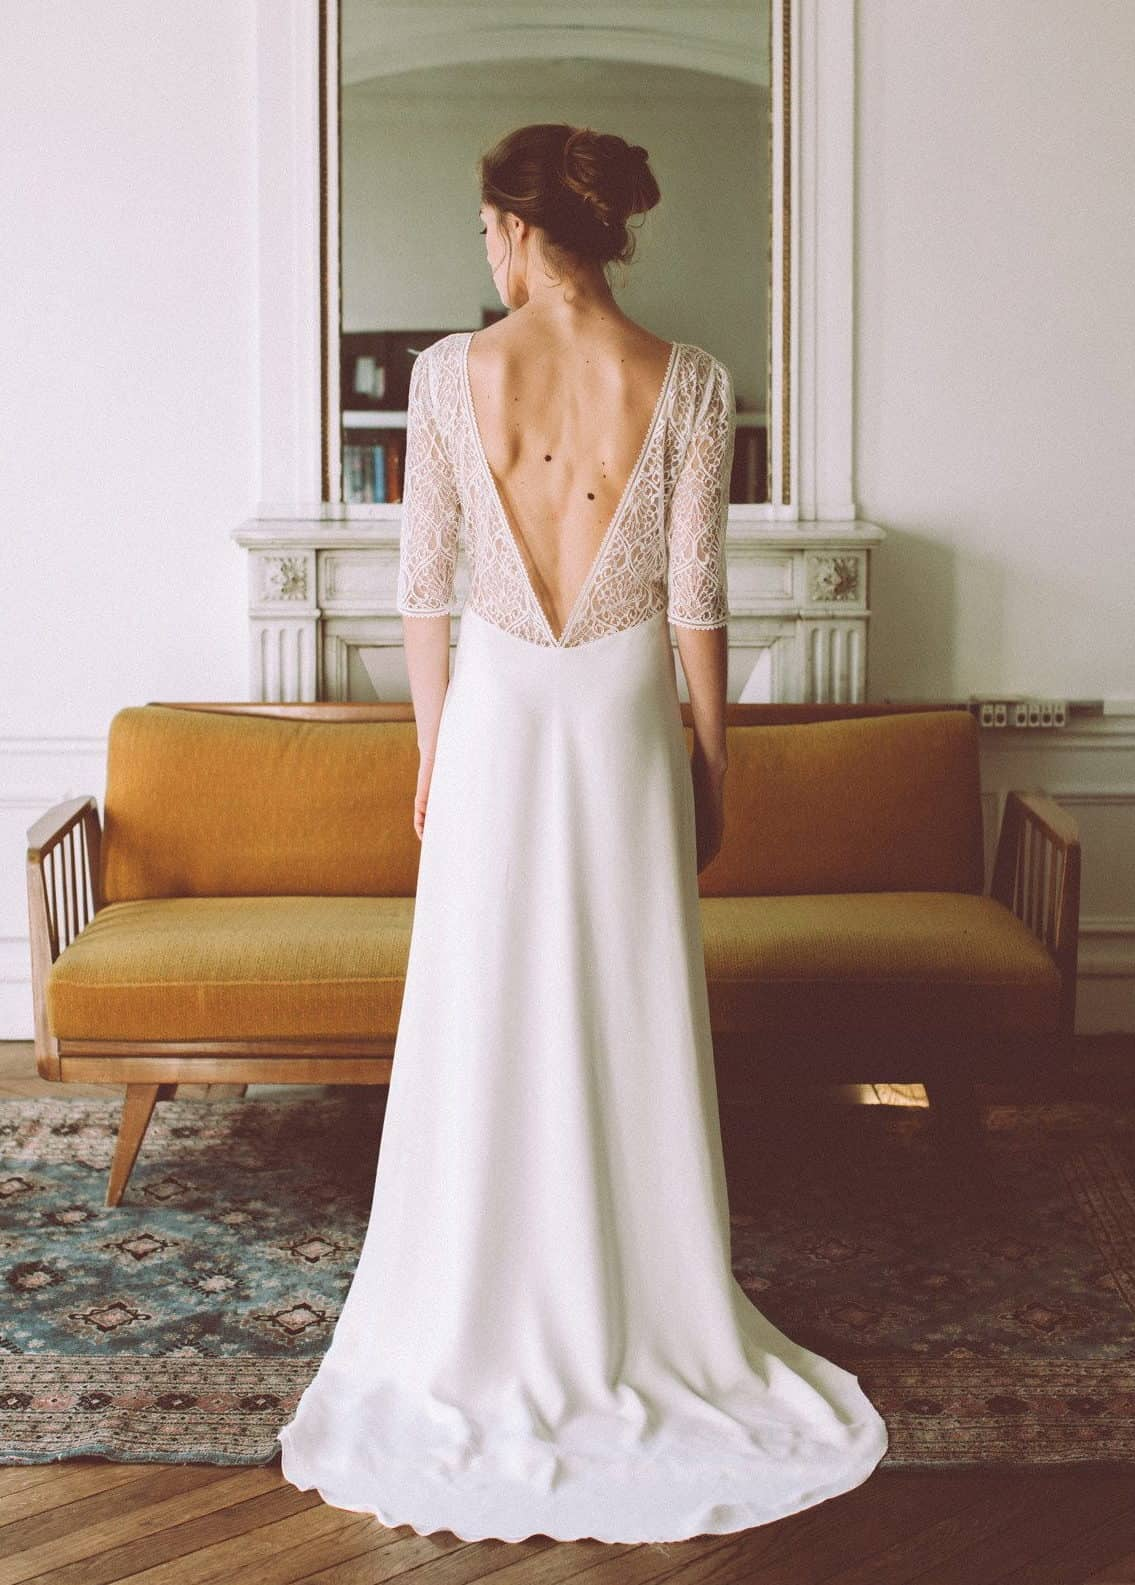 bride with a bareback wedding dress